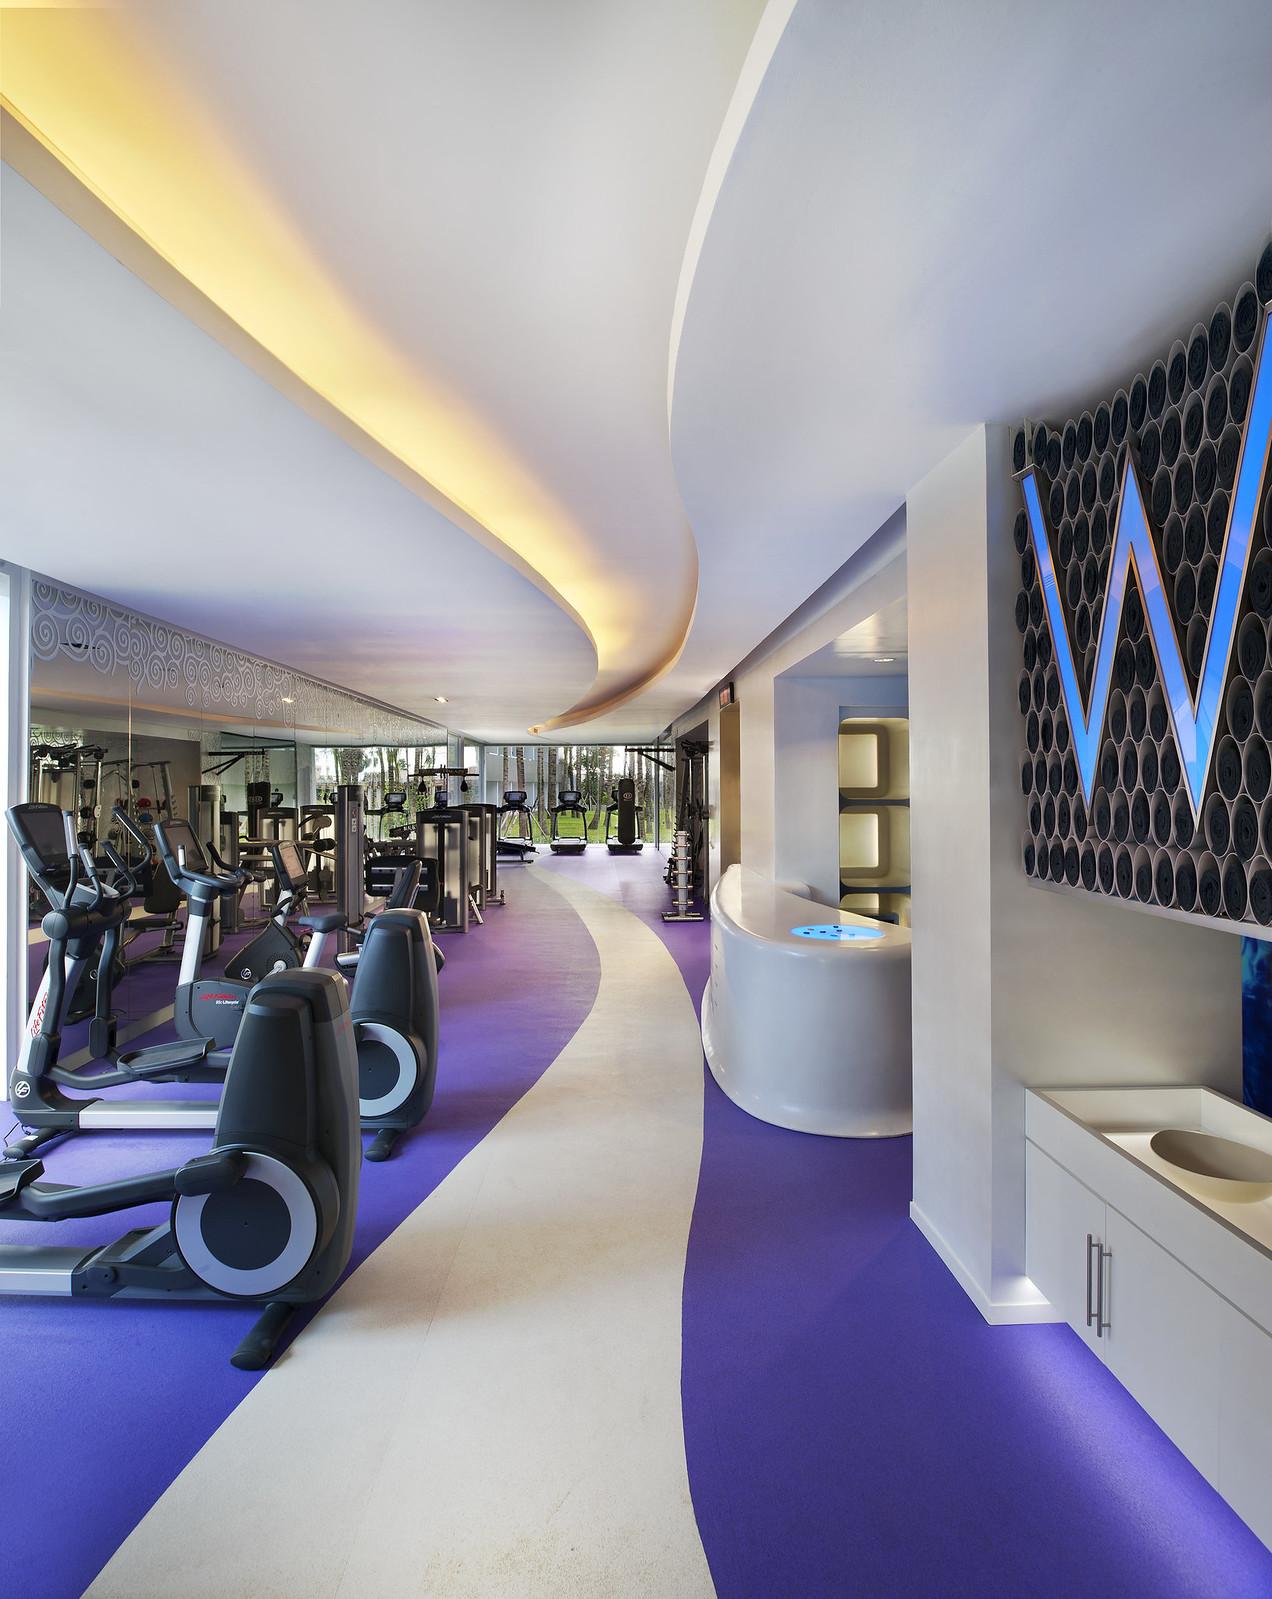 All sizes w retreat spa bali seminyak sweat flickr for W hotel bali interior design